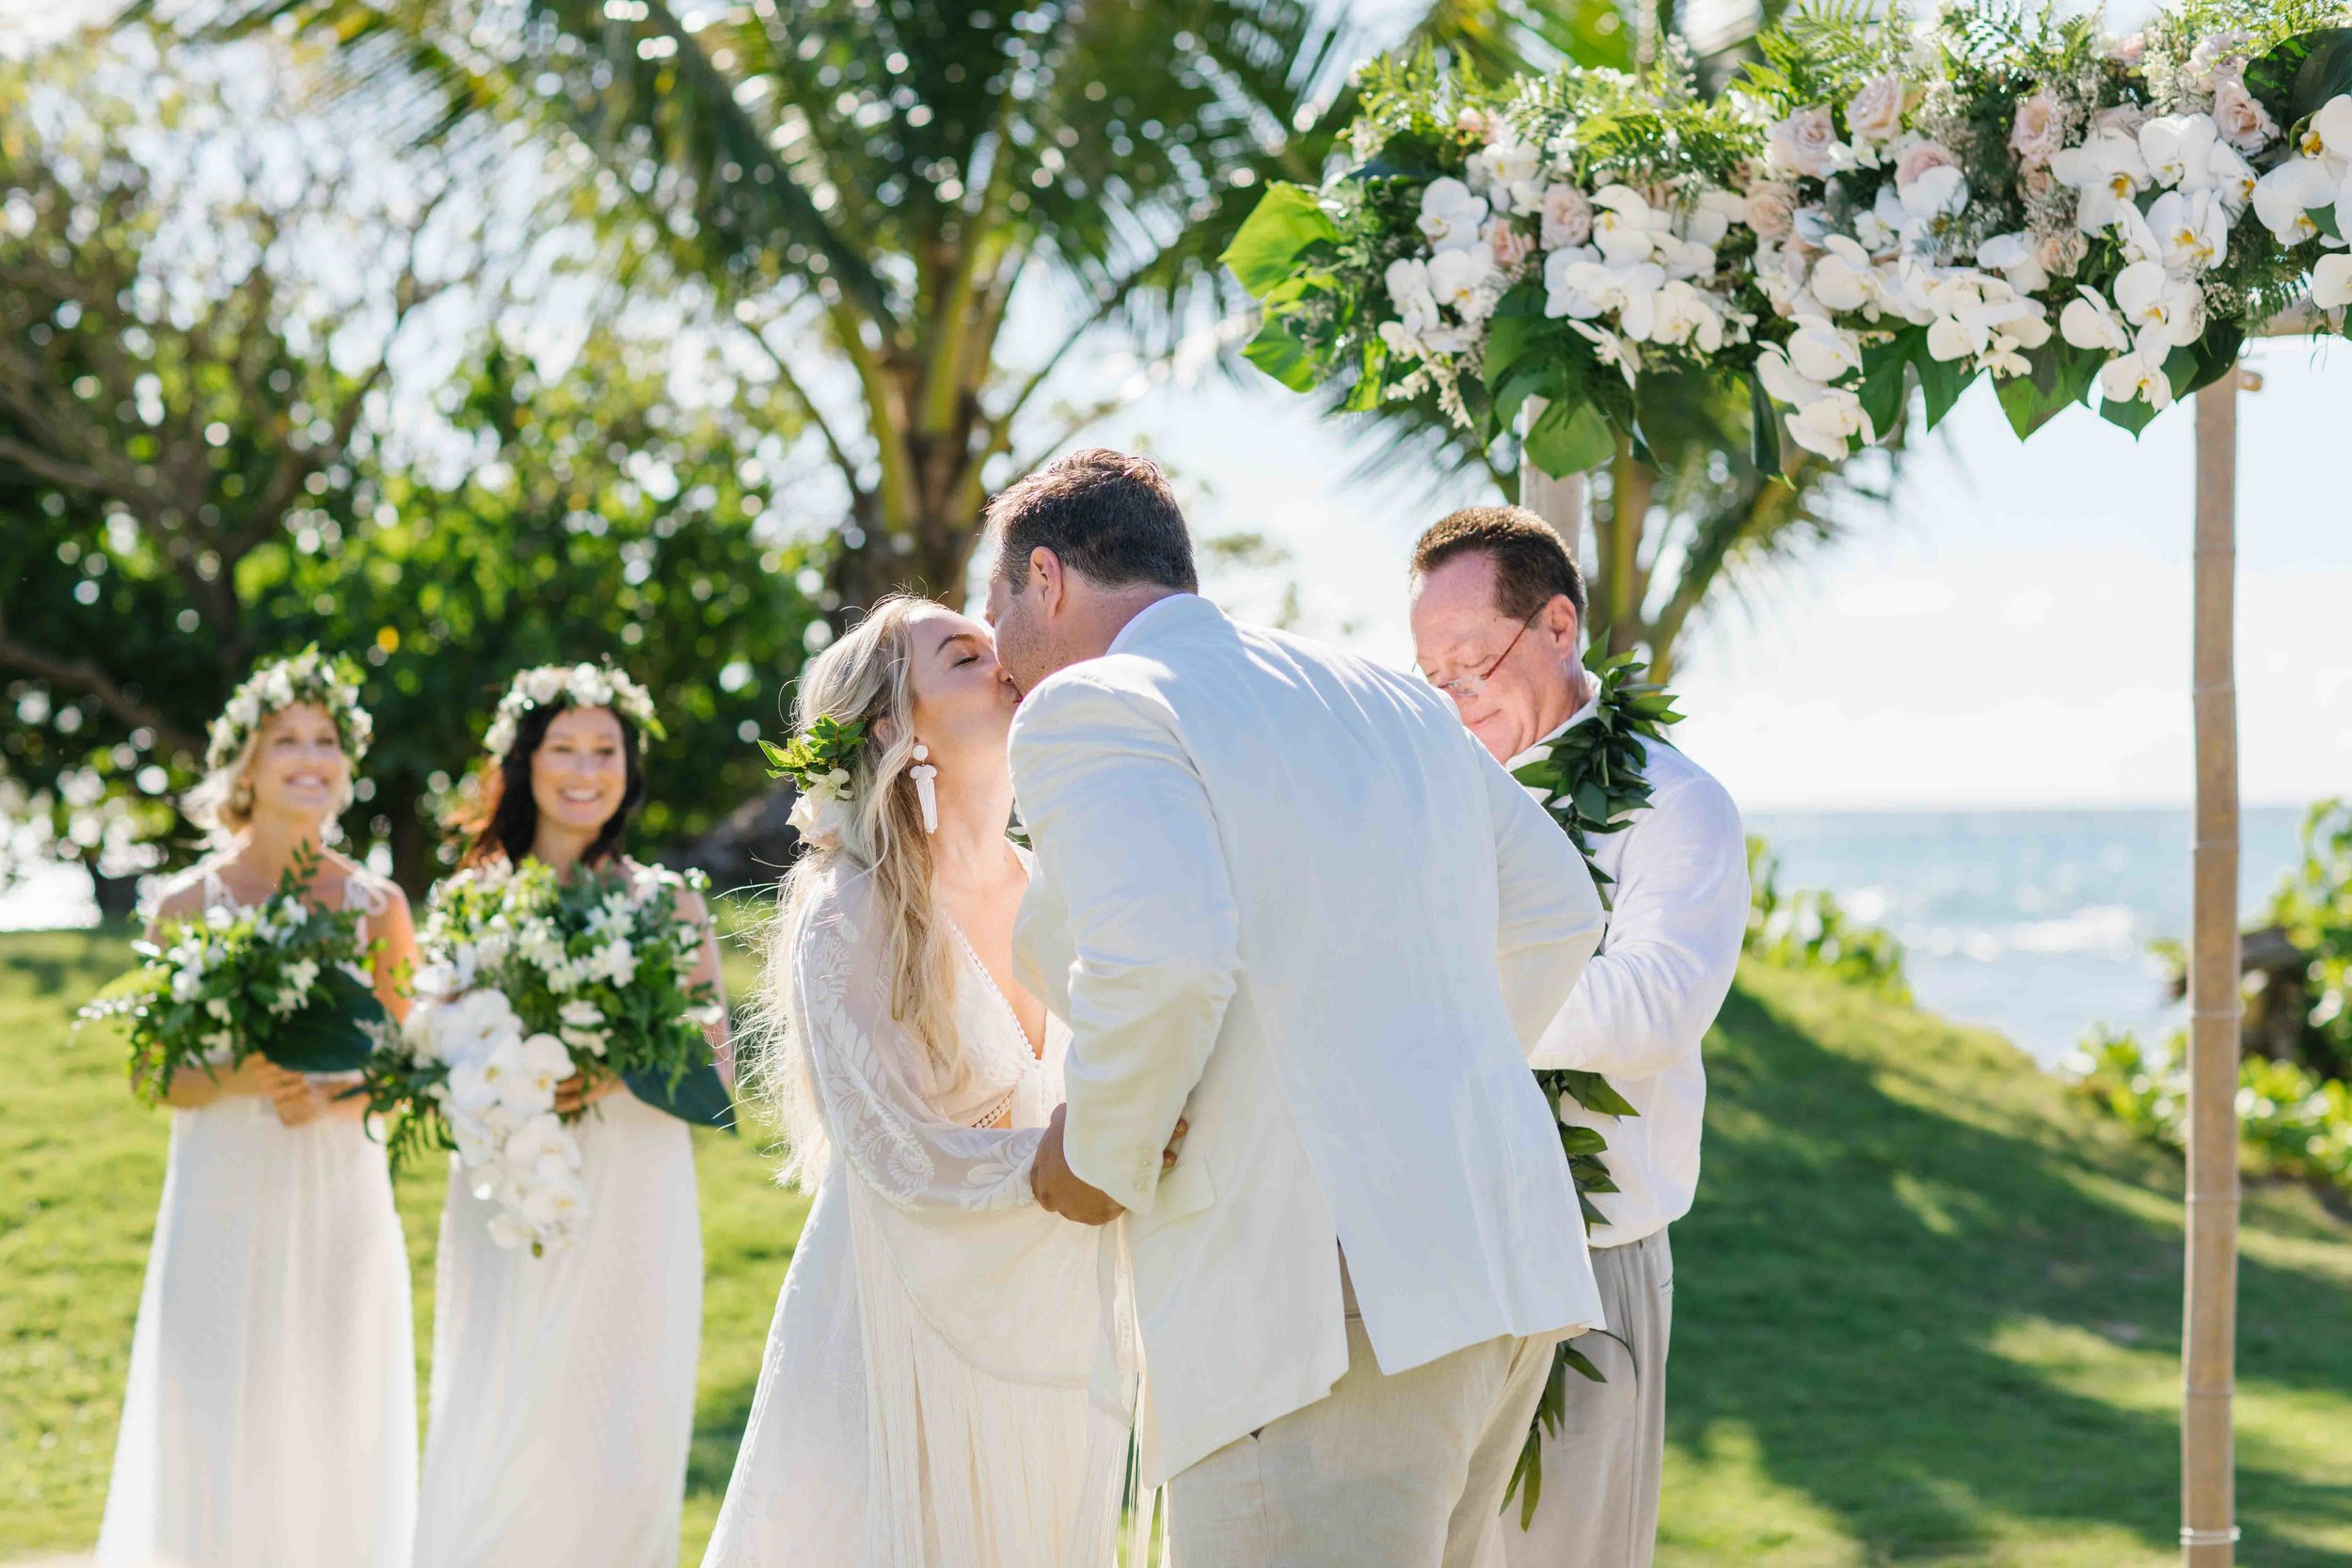 Oahu Wedding Photography at Loulu Palm Farm Estate